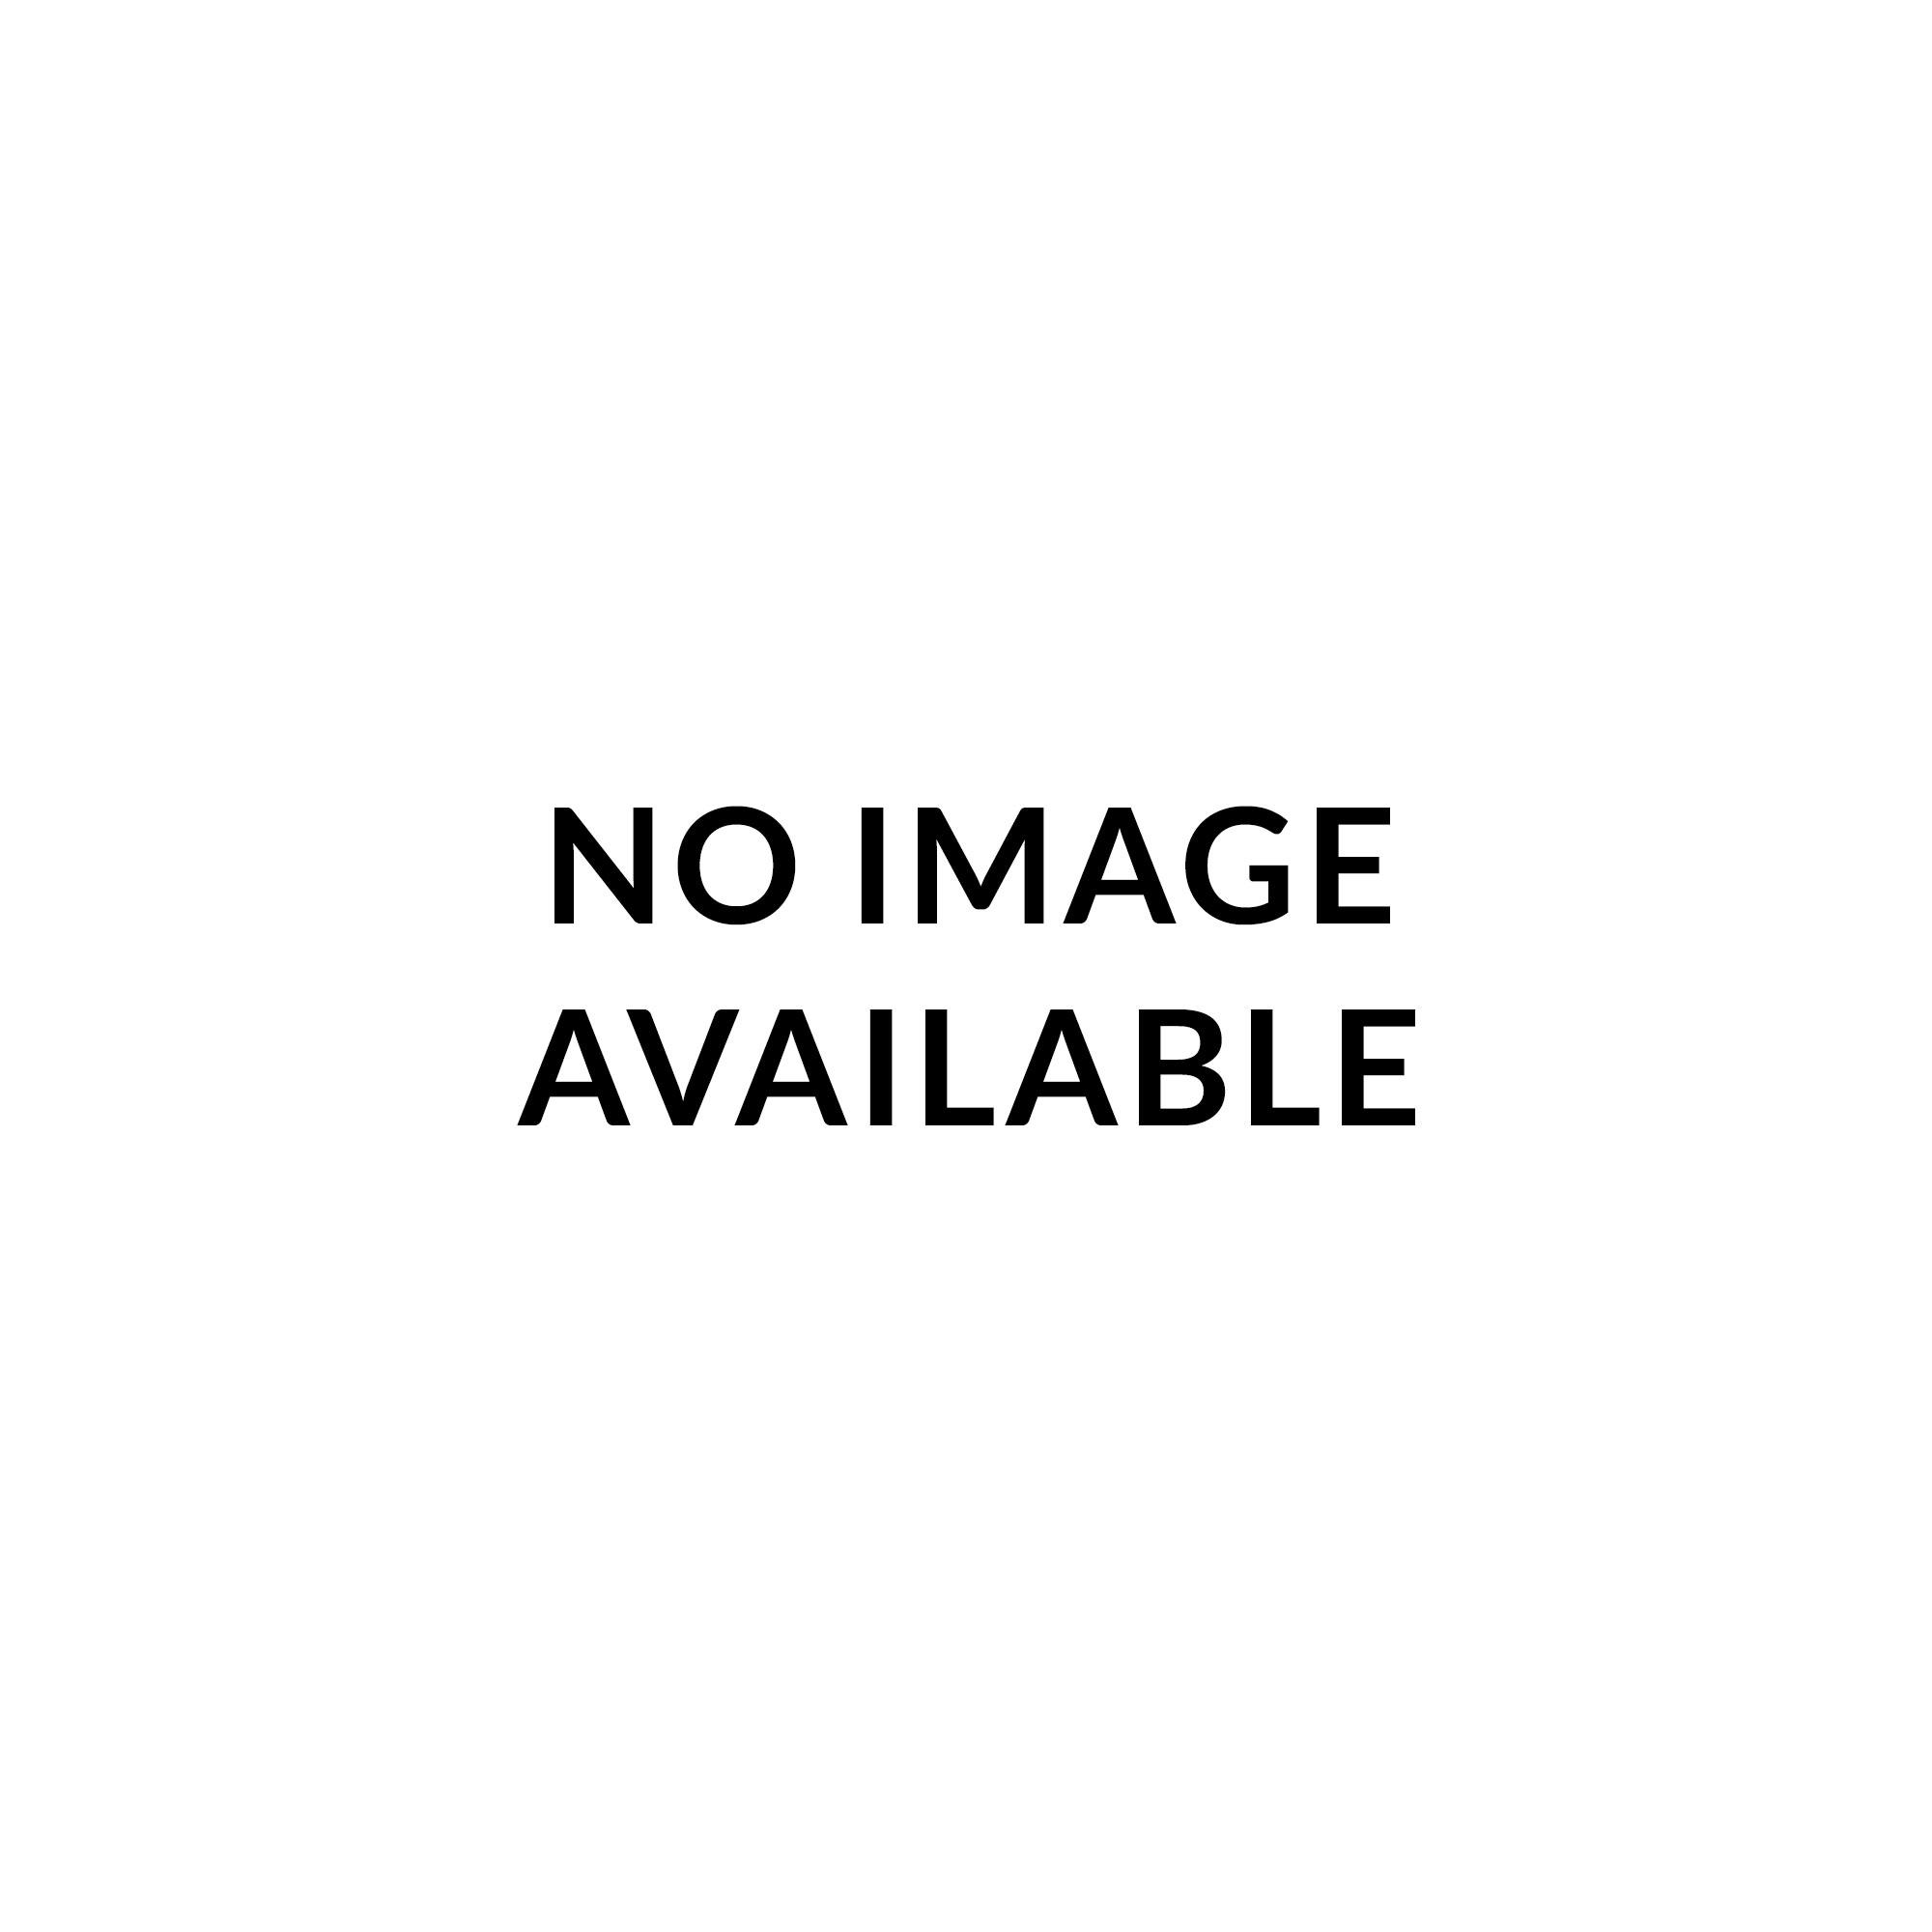 D'Addario EXL125-5PACK Nickel Wound 09-46 Custom Light Electric Guitar Strings 5 SETS